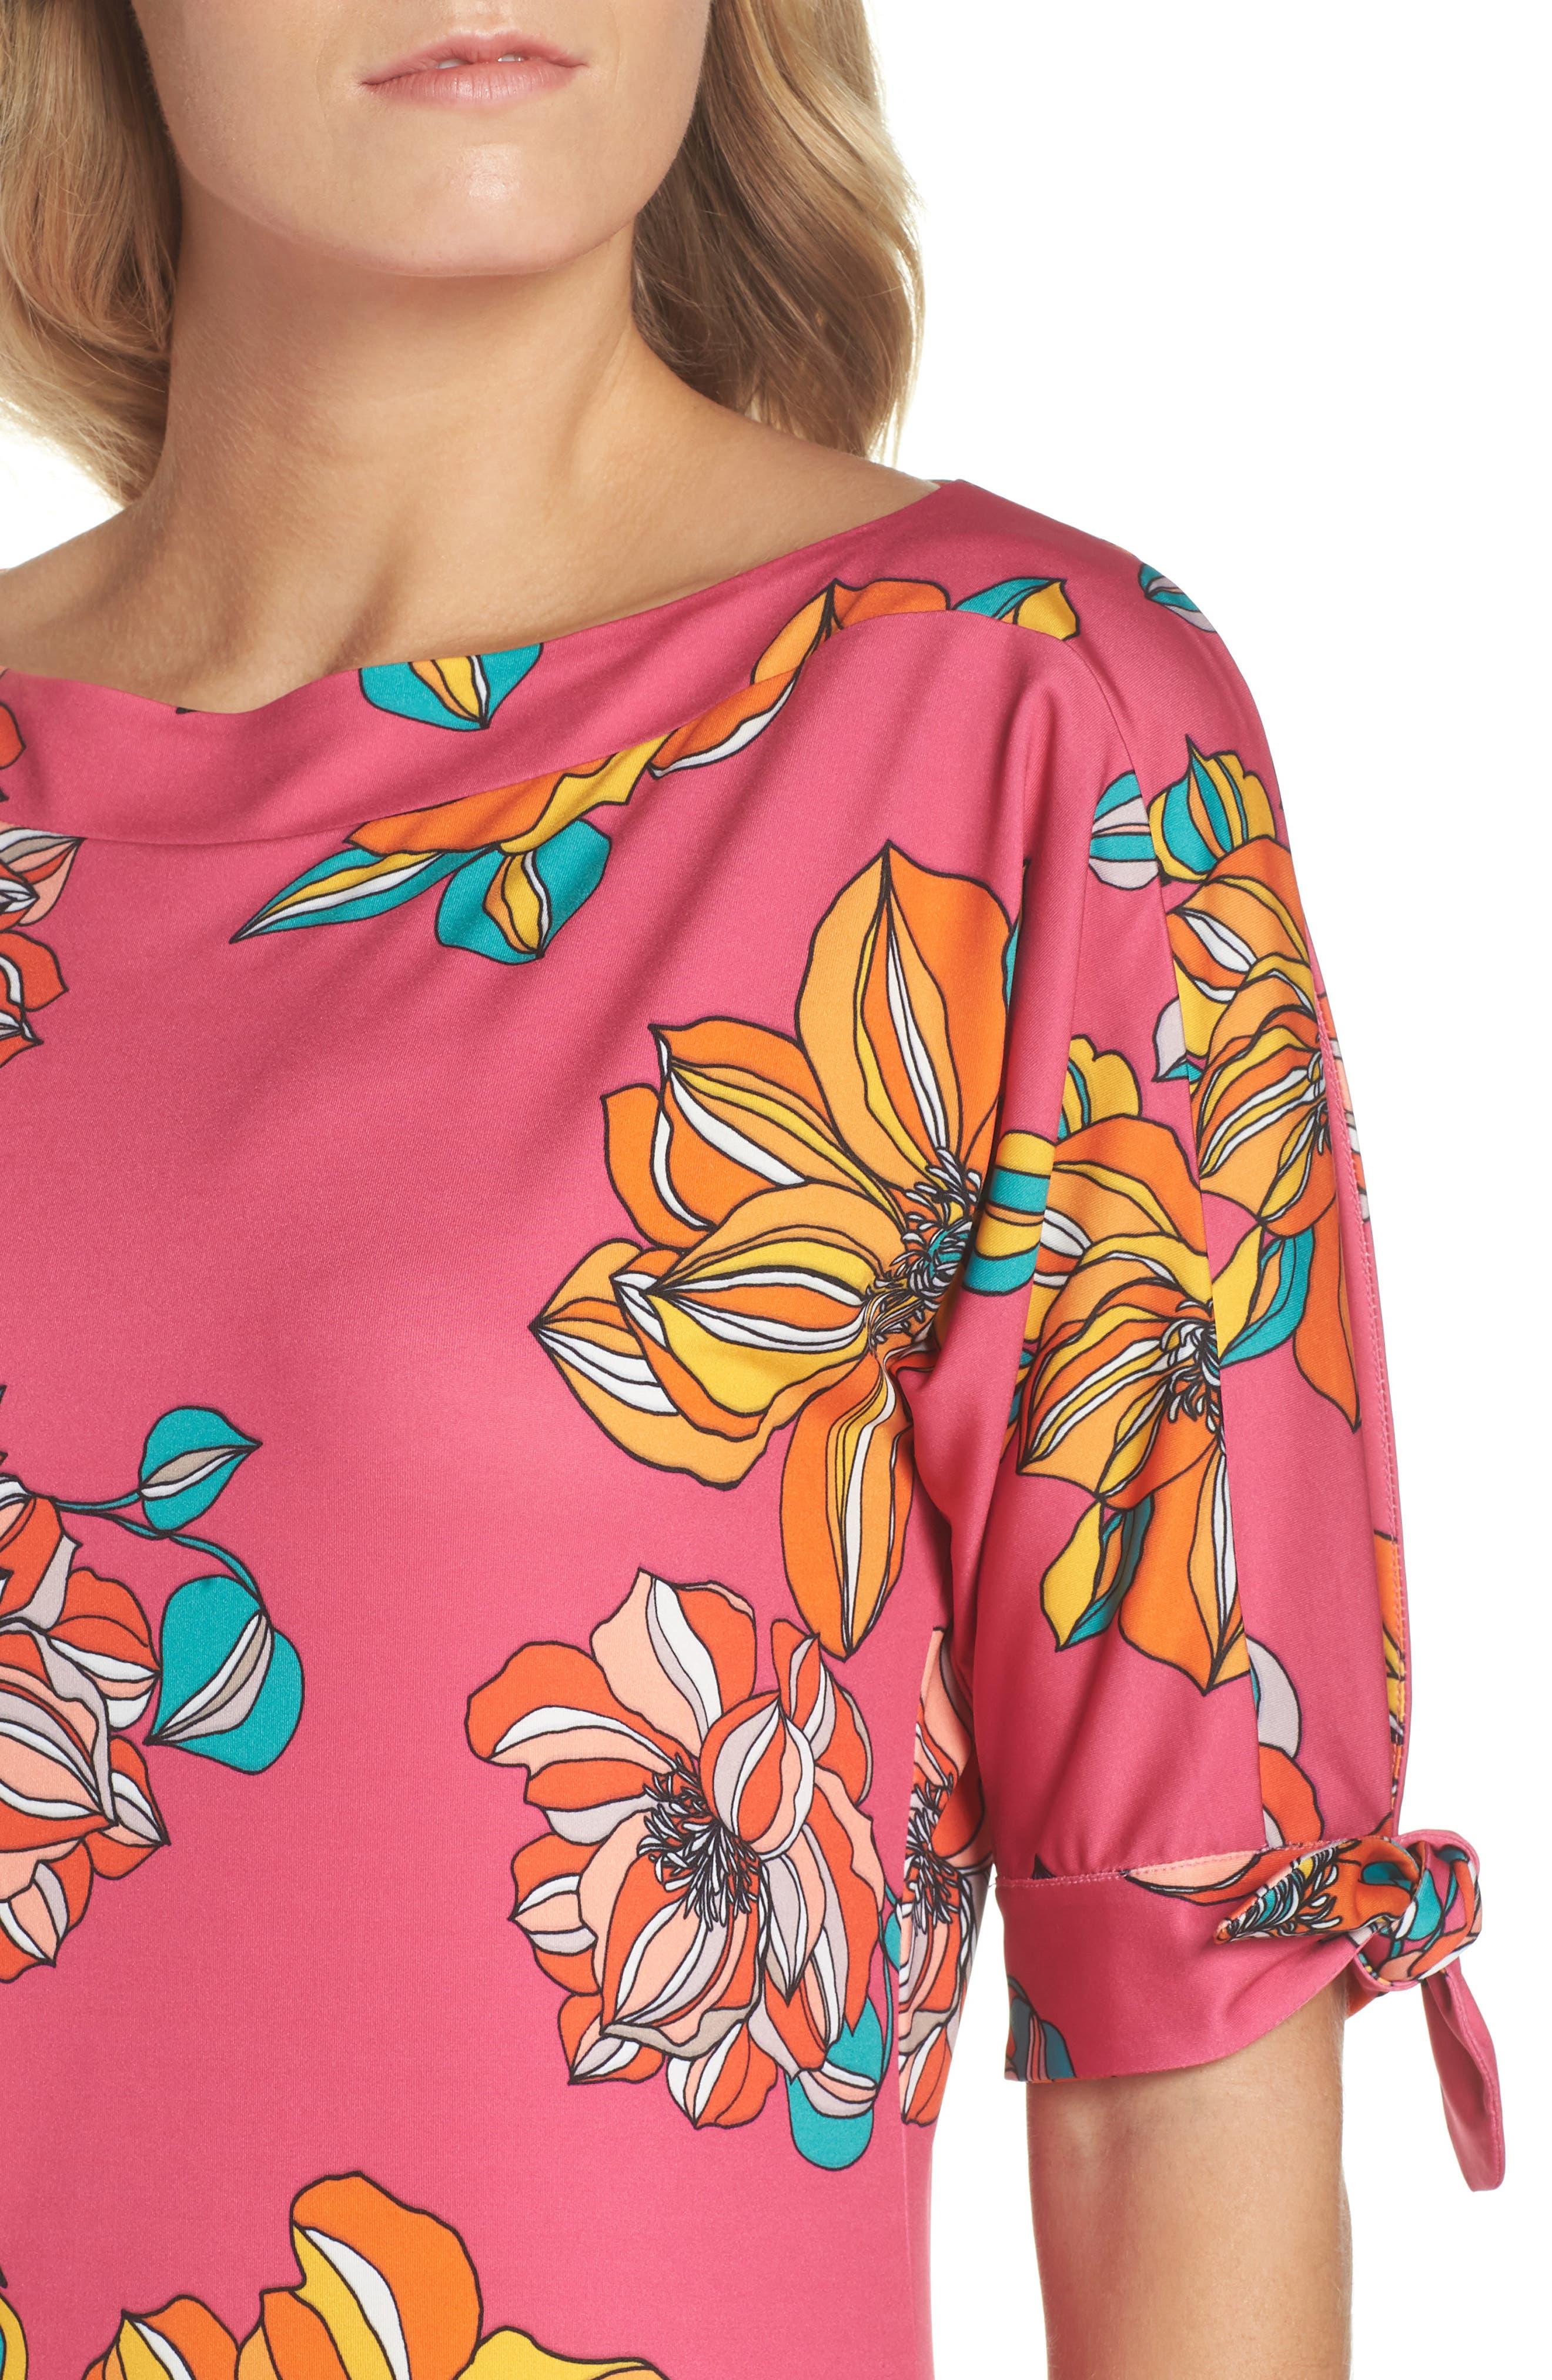 Vinet Floral Jersey Dress,                             Alternate thumbnail 4, color,                             650